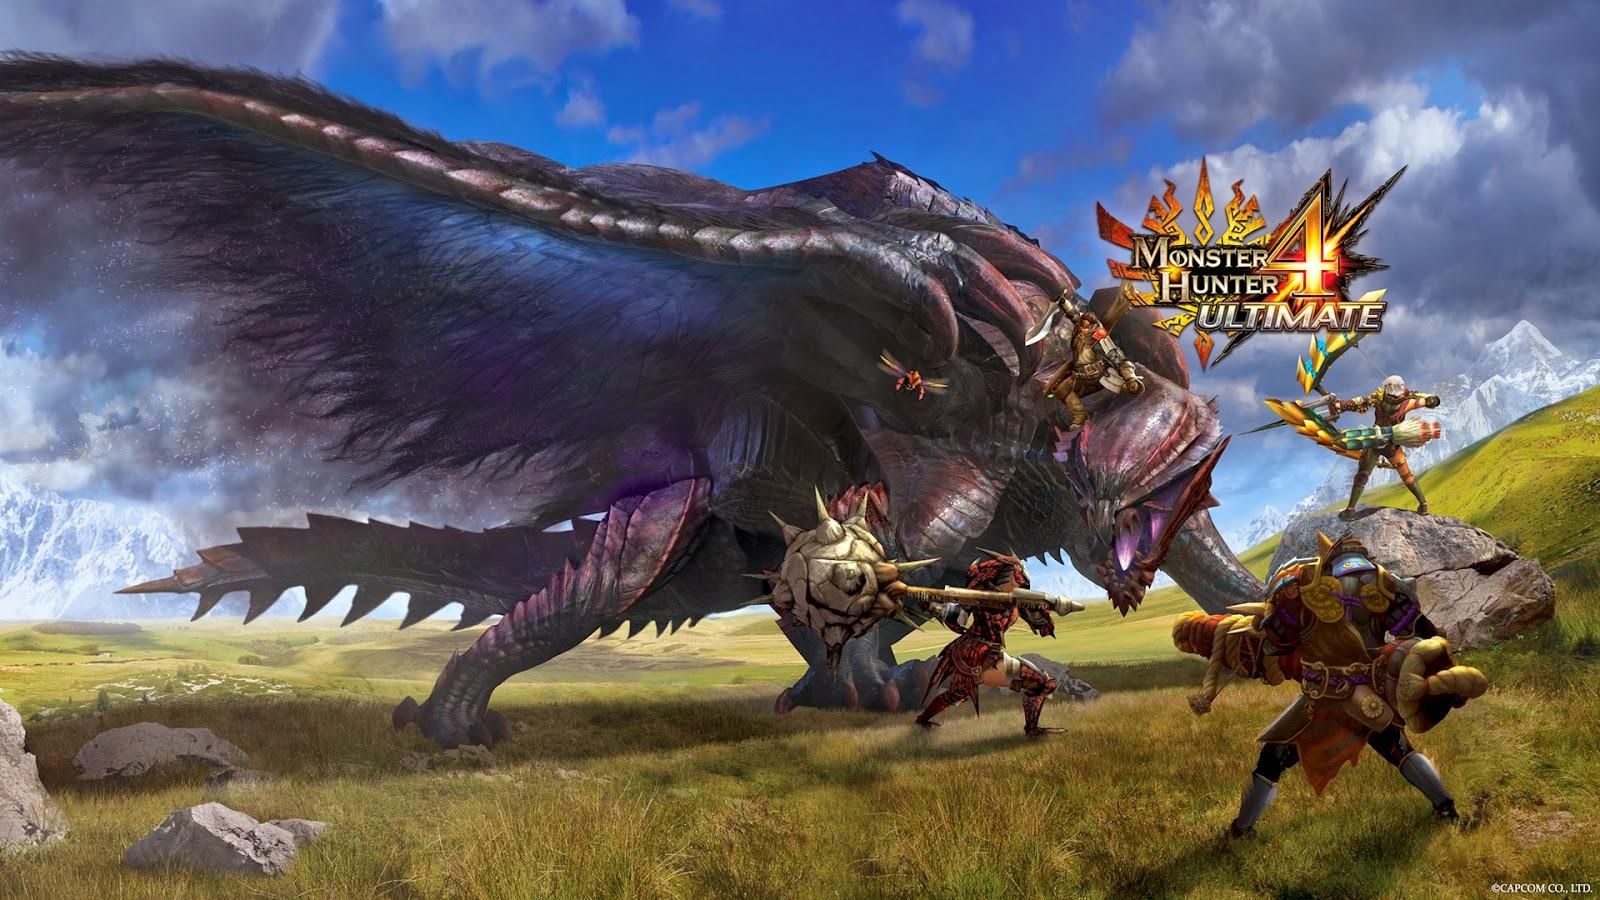 Programa 8x25 (01-05-2015) 'Monster Hunter 4 Ultimate'  Capcom-reveals-monster-hunter-4-ultimate-box-art-a_rsky-1411030846119